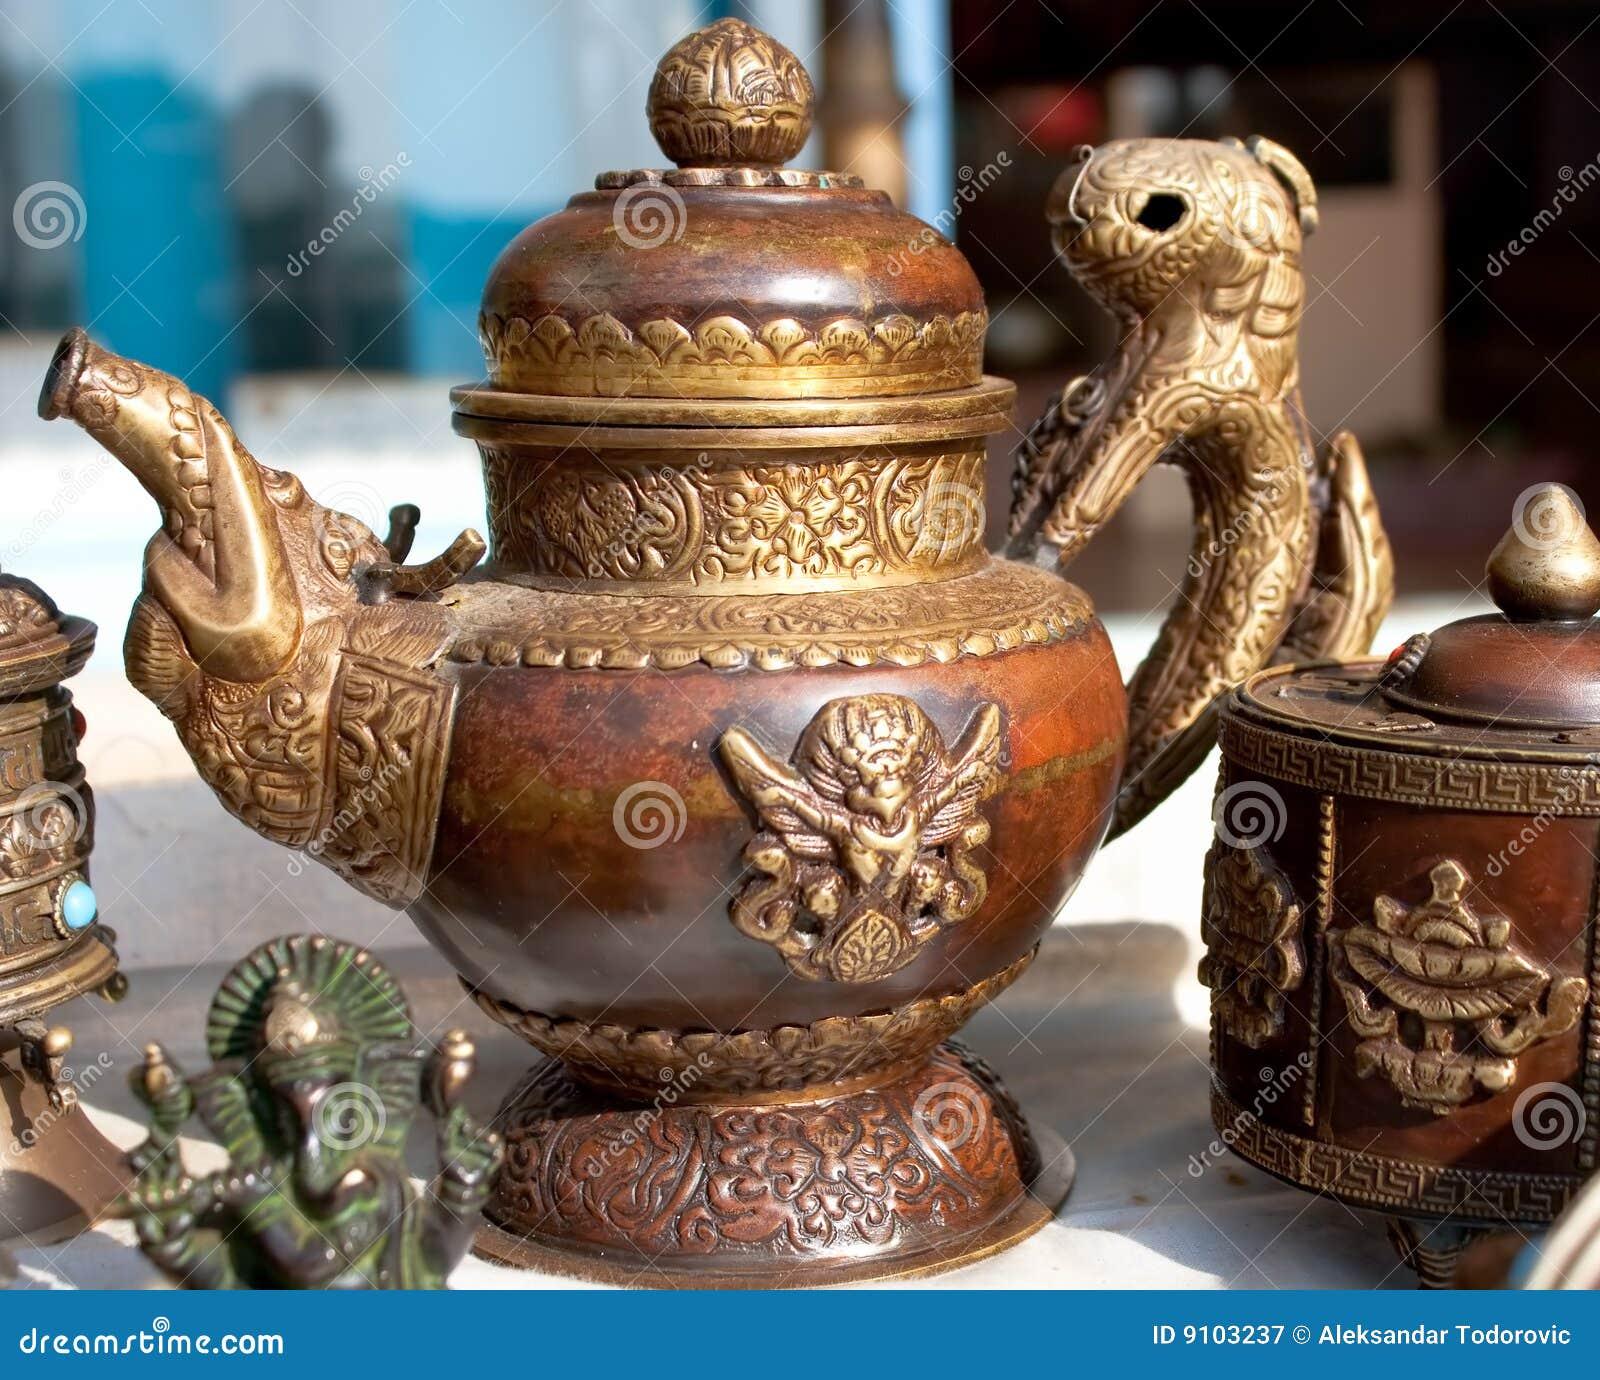 Traditional Tibetan Tea Pot And Sugar Box Royalty Free